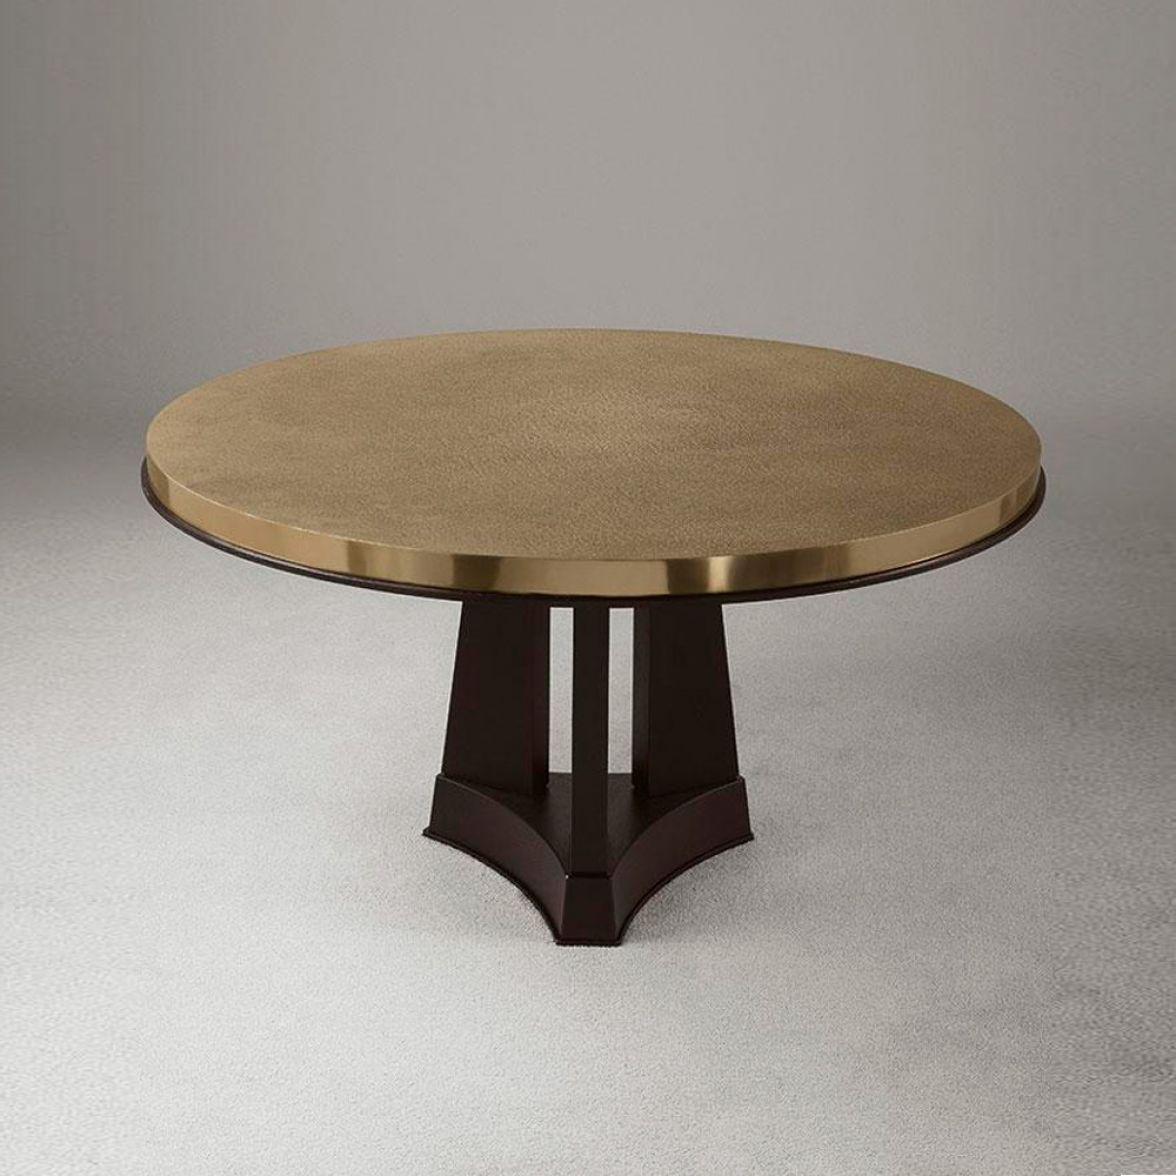 Murat dining table